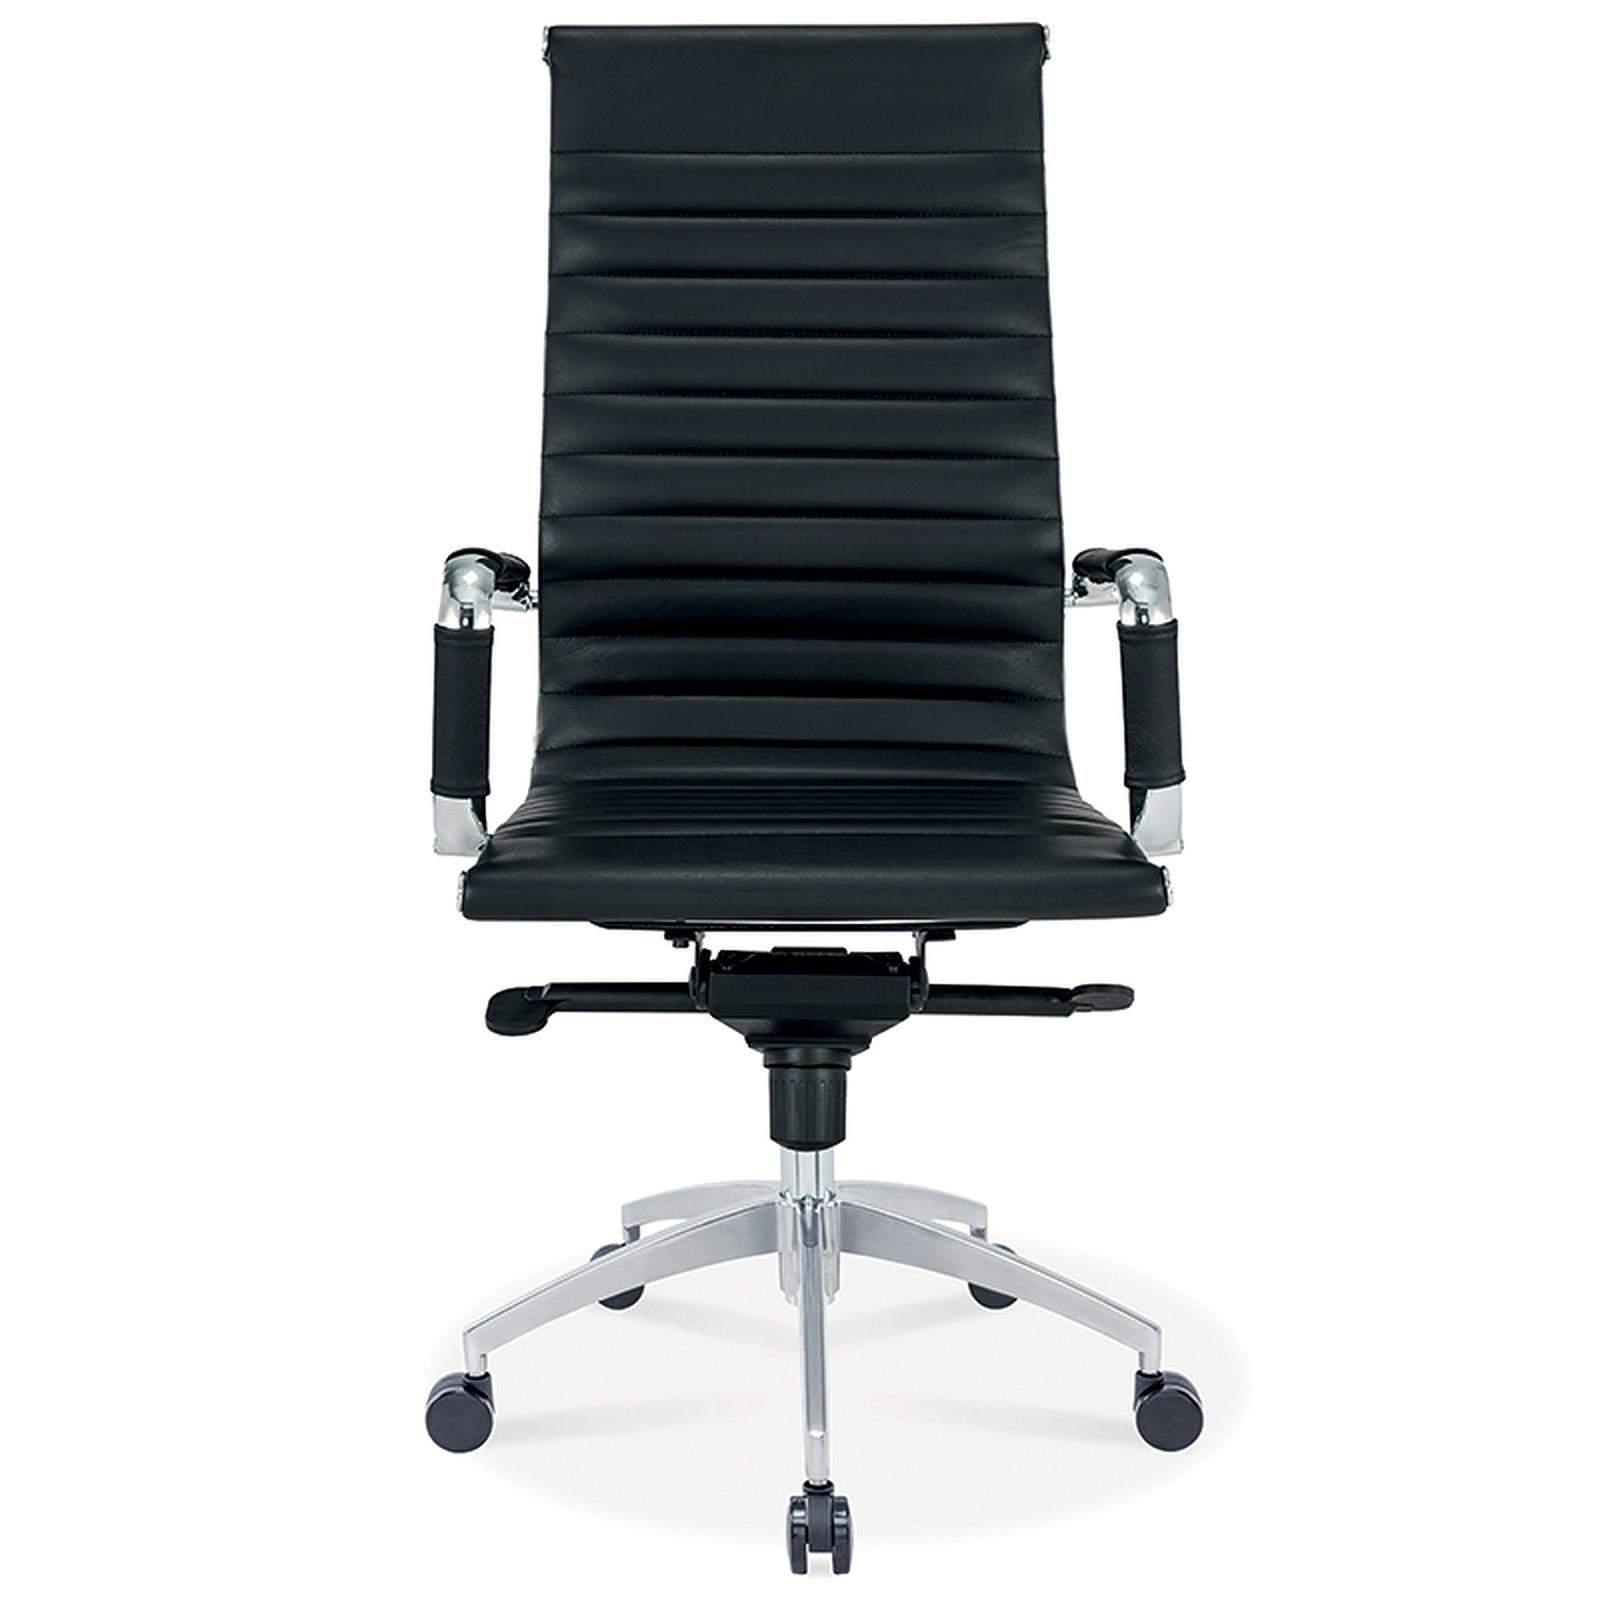 mti fauteuil mtga65x dossier haut en cuir noir